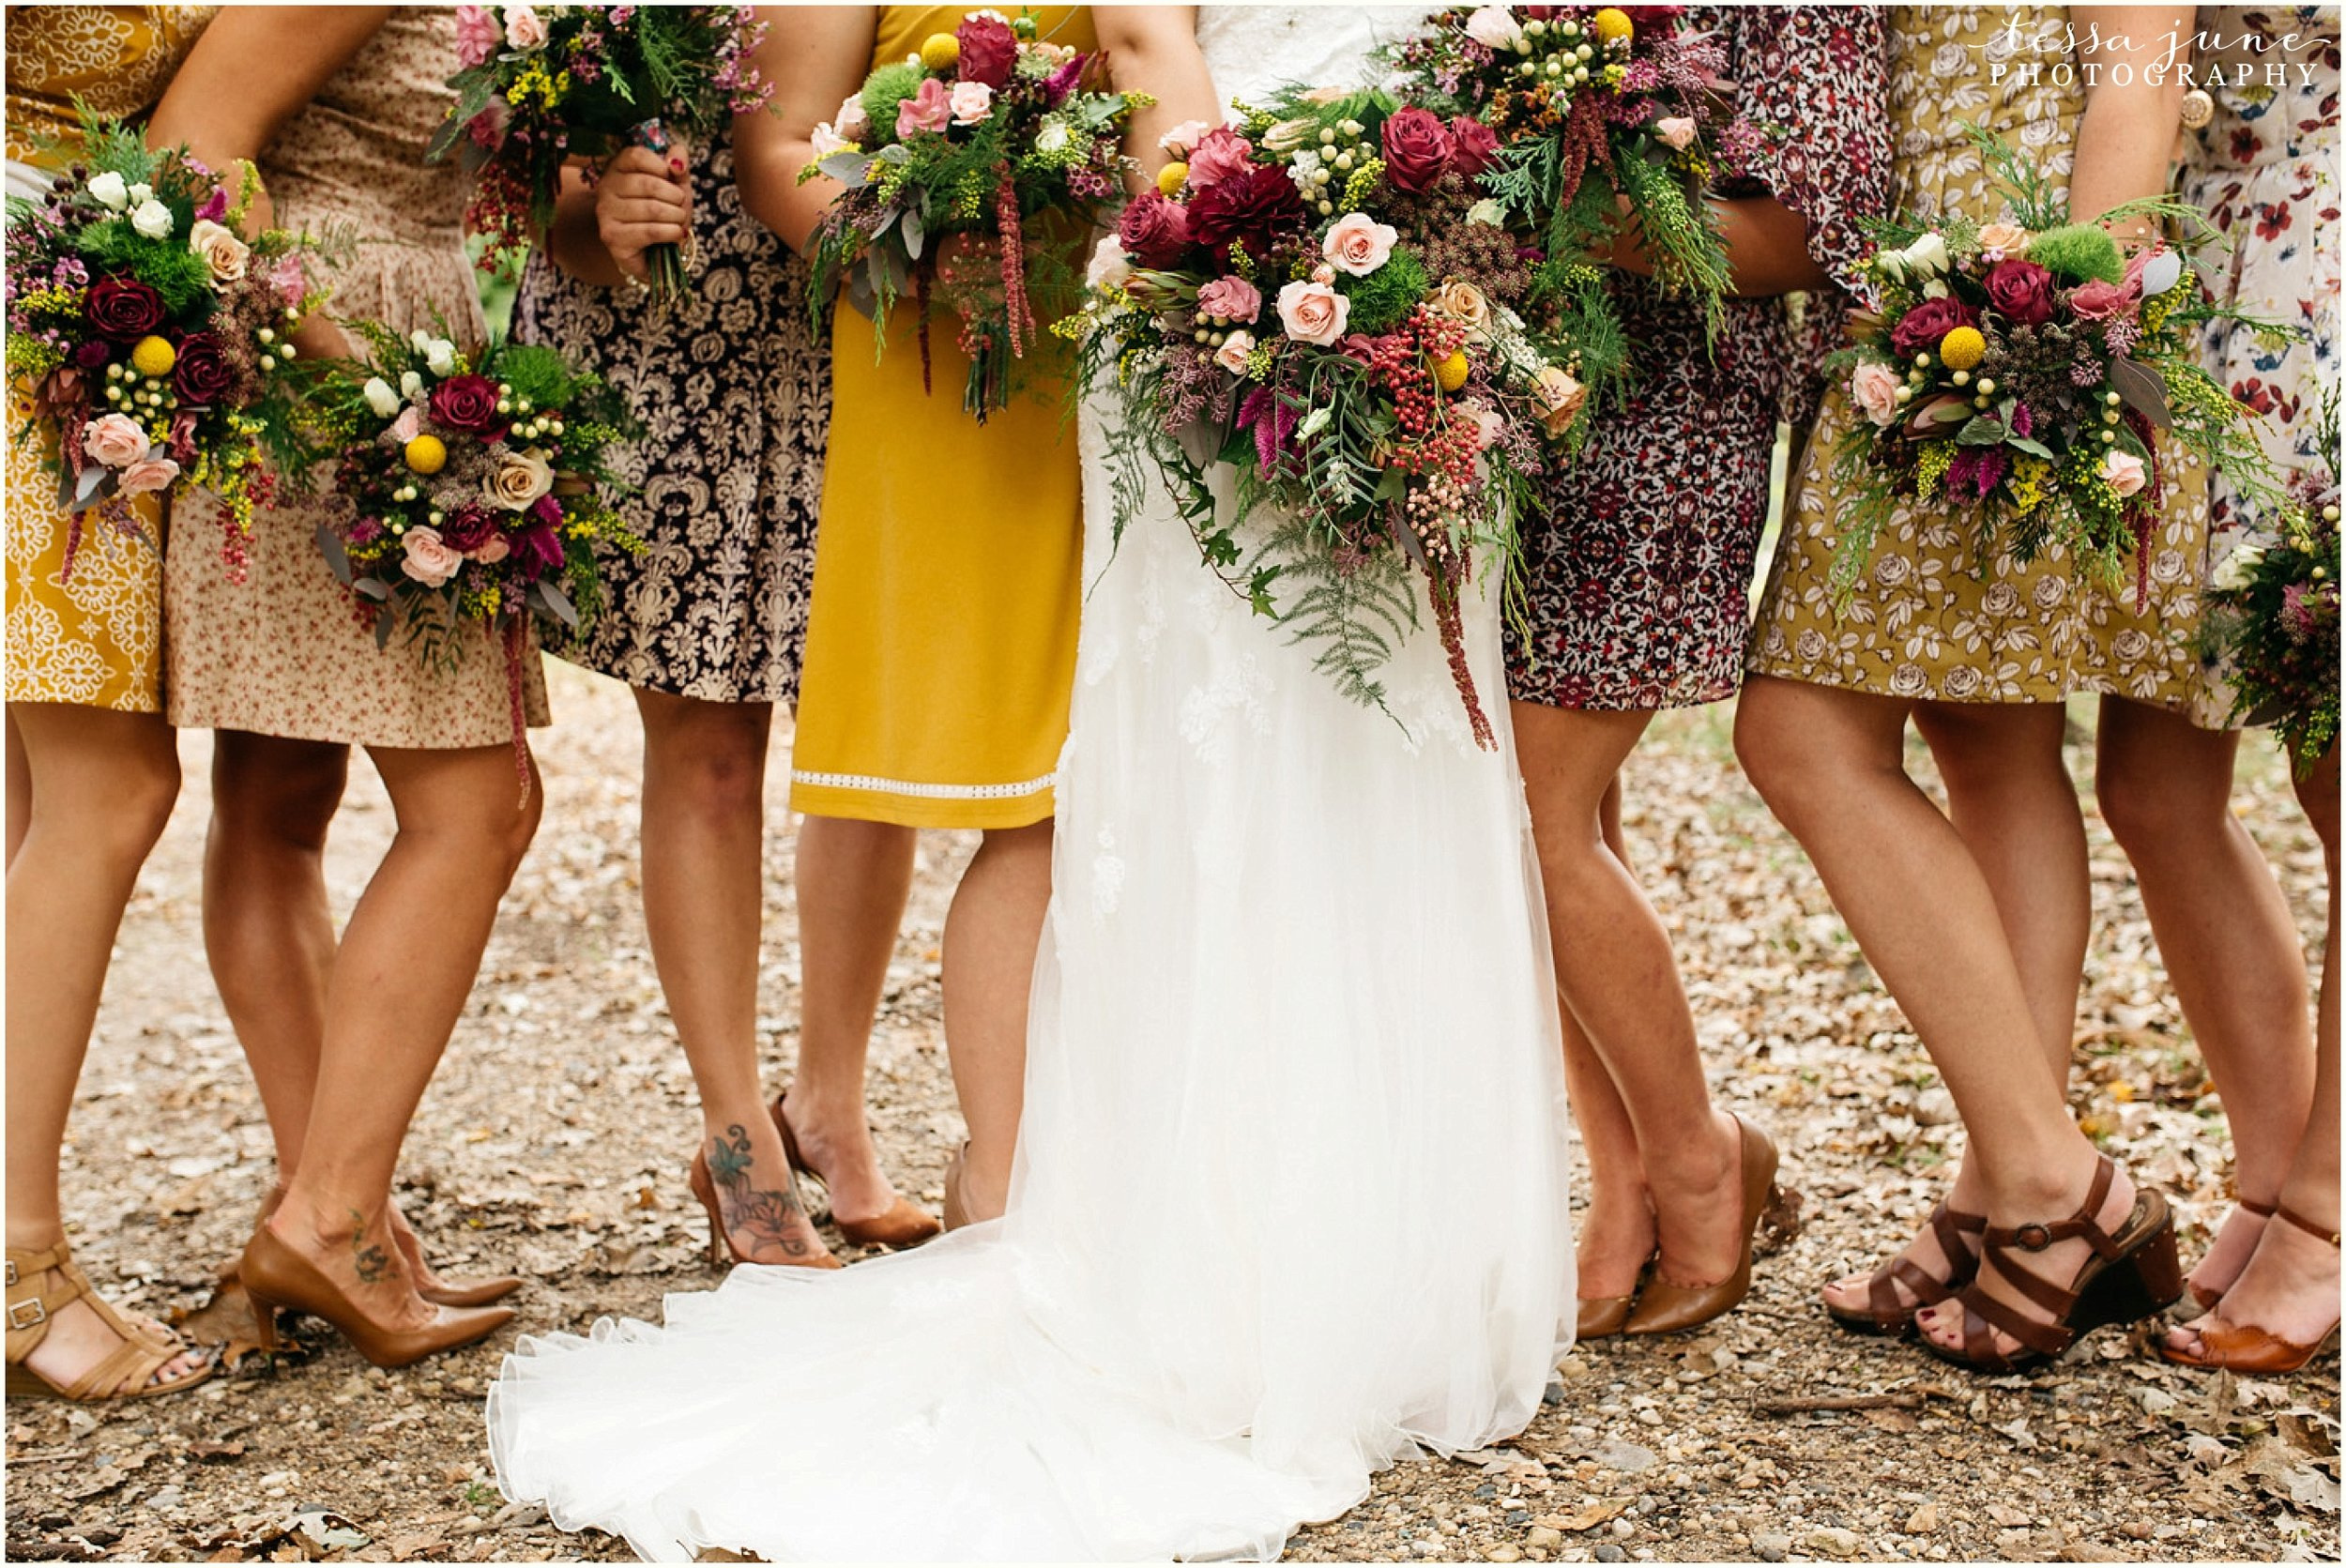 bohemian-minnesota-wedding-mismatched-bridesmaid-dresses-waterfall-st-cloud-tessa-june-photography-74.jpg